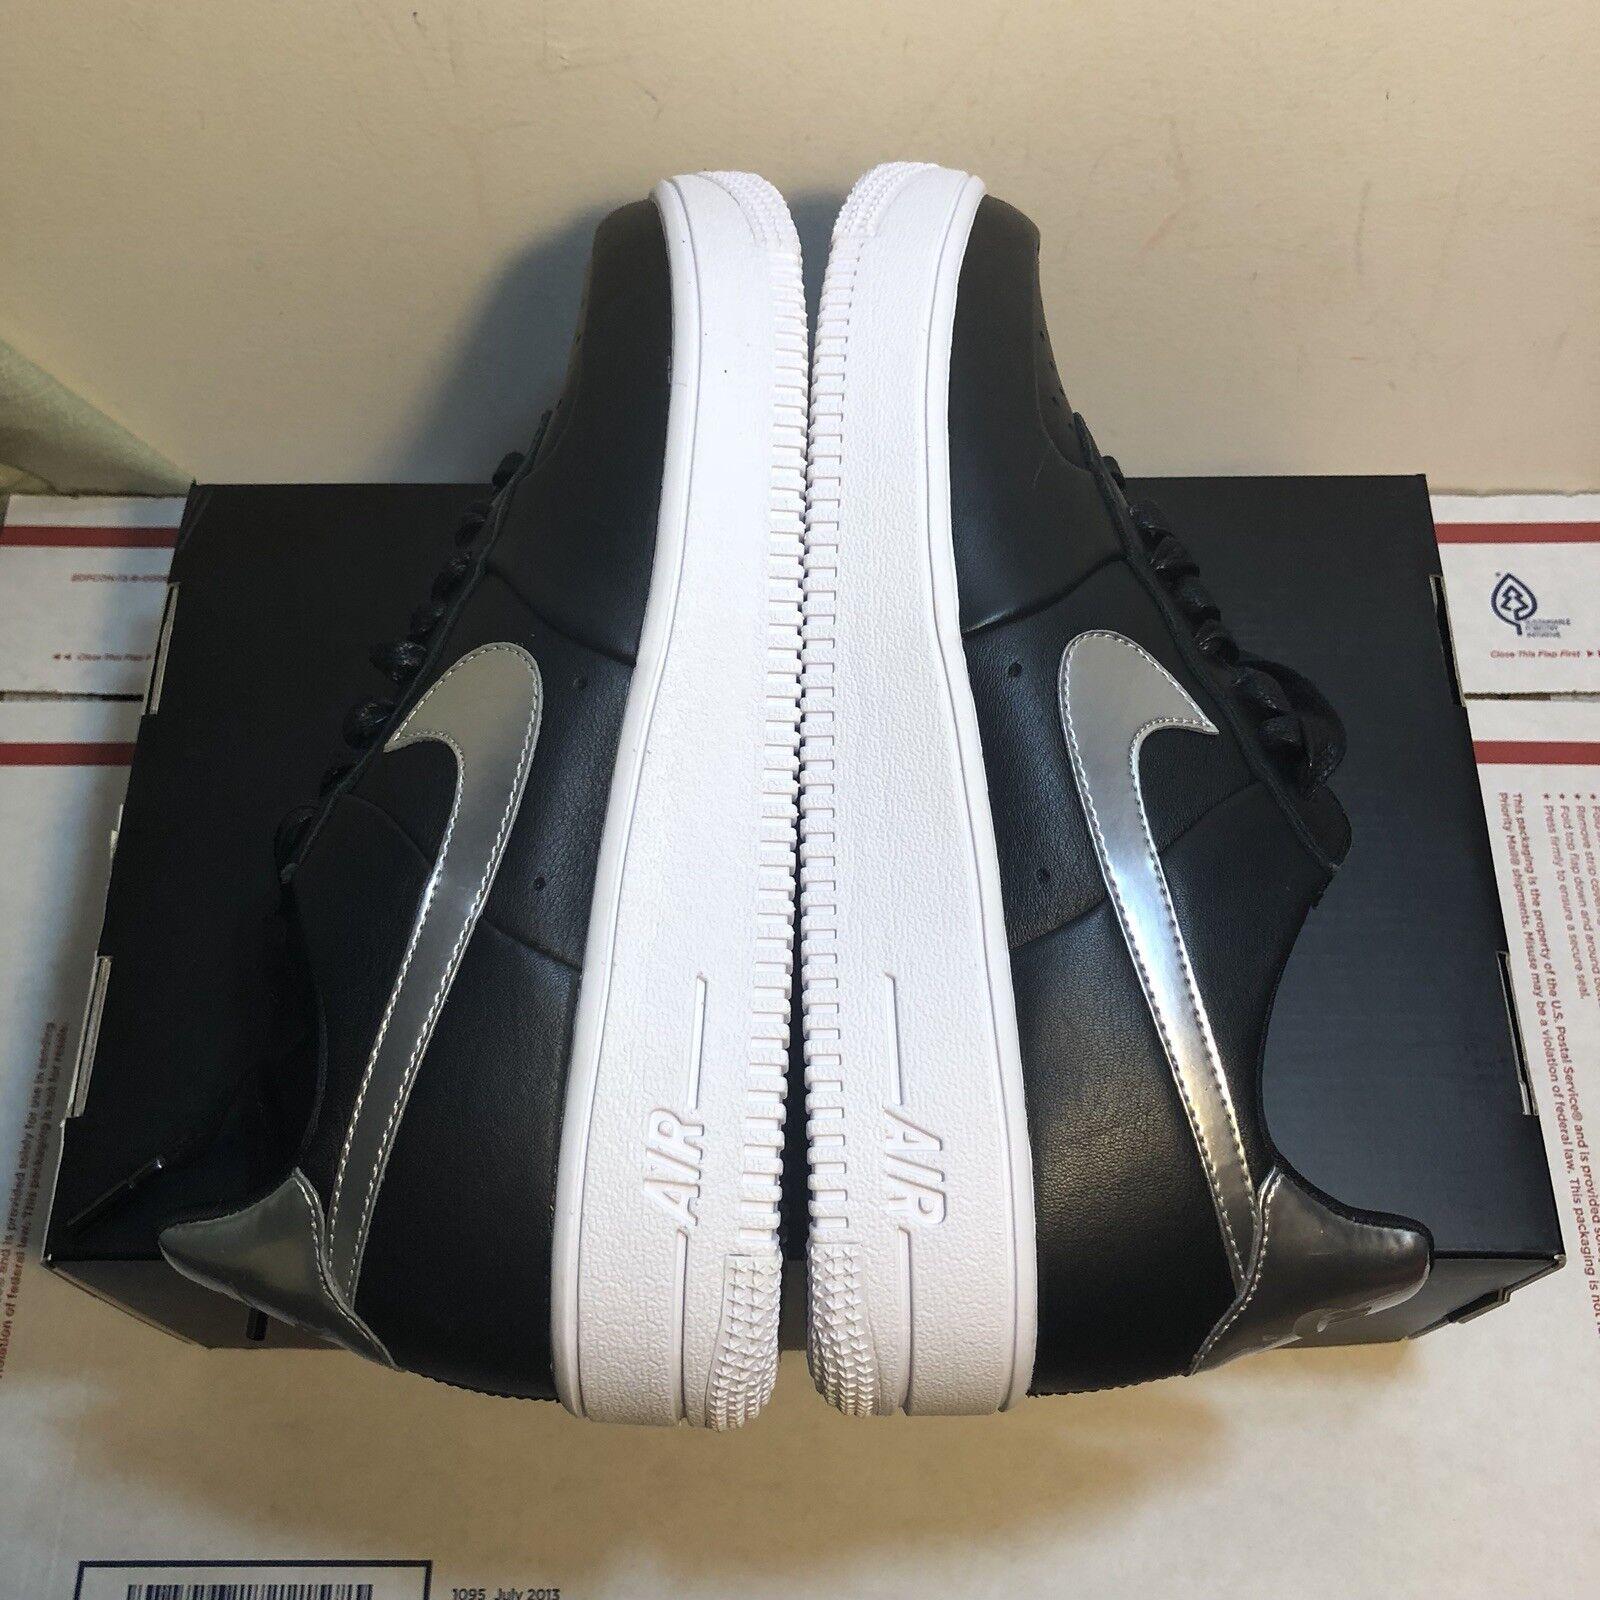 Nike Mens Air Force 1 Ultra Force RKK Patriots Robert Kraft 904803-001 Size 8